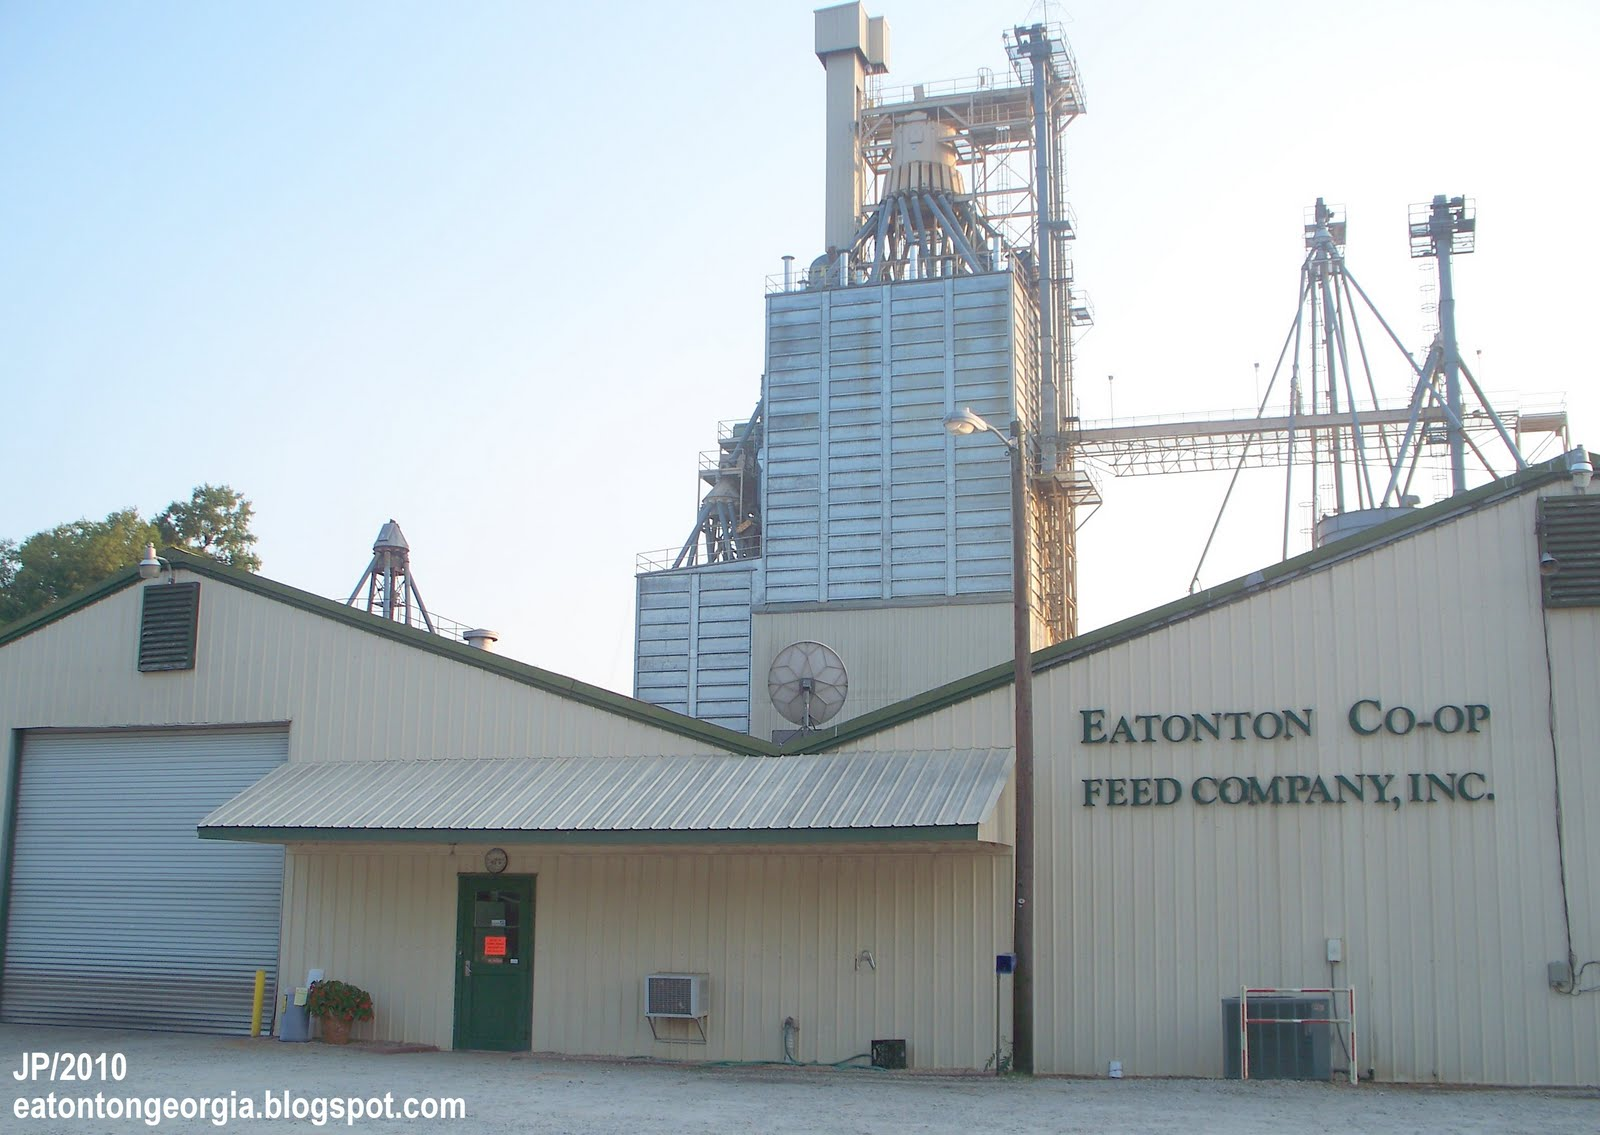 Eatonton georgia putnam co restaurant dr hospital bank church attorney city fire police dept for Colocation brighton